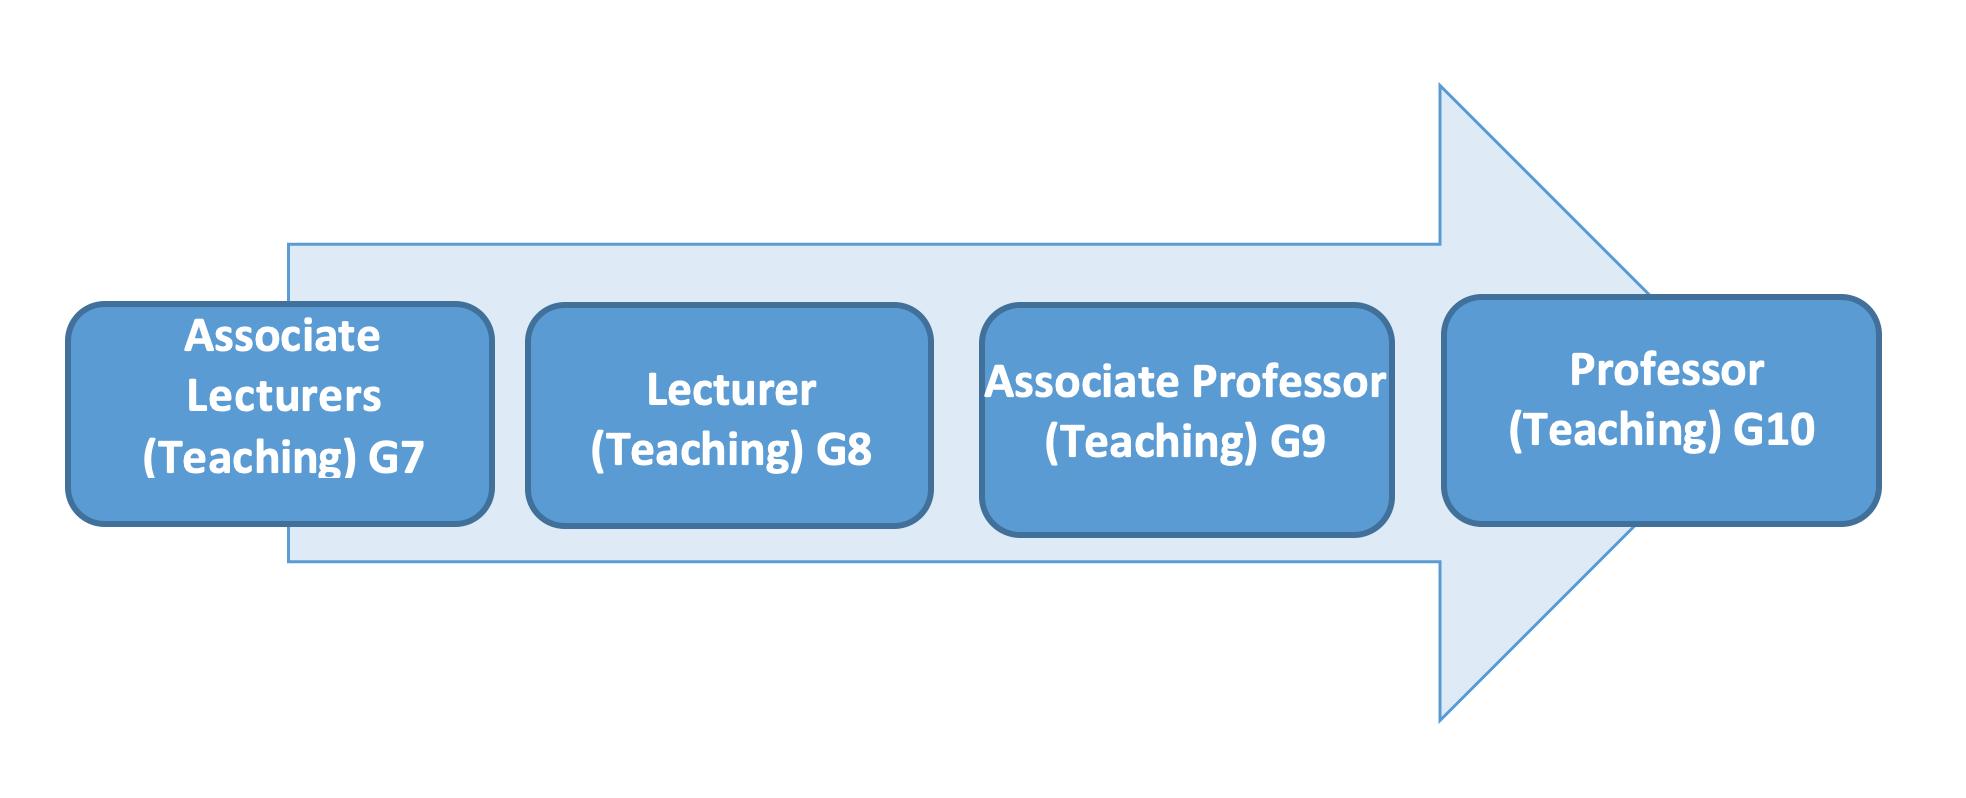 Standard academic promotion route. Associate Lecturers (Teaching) Grade 7, Lecturer (Teaching) Grade 8, Associate Professor (Teaching) Grade 9, Professor (Teaching) Grade 10